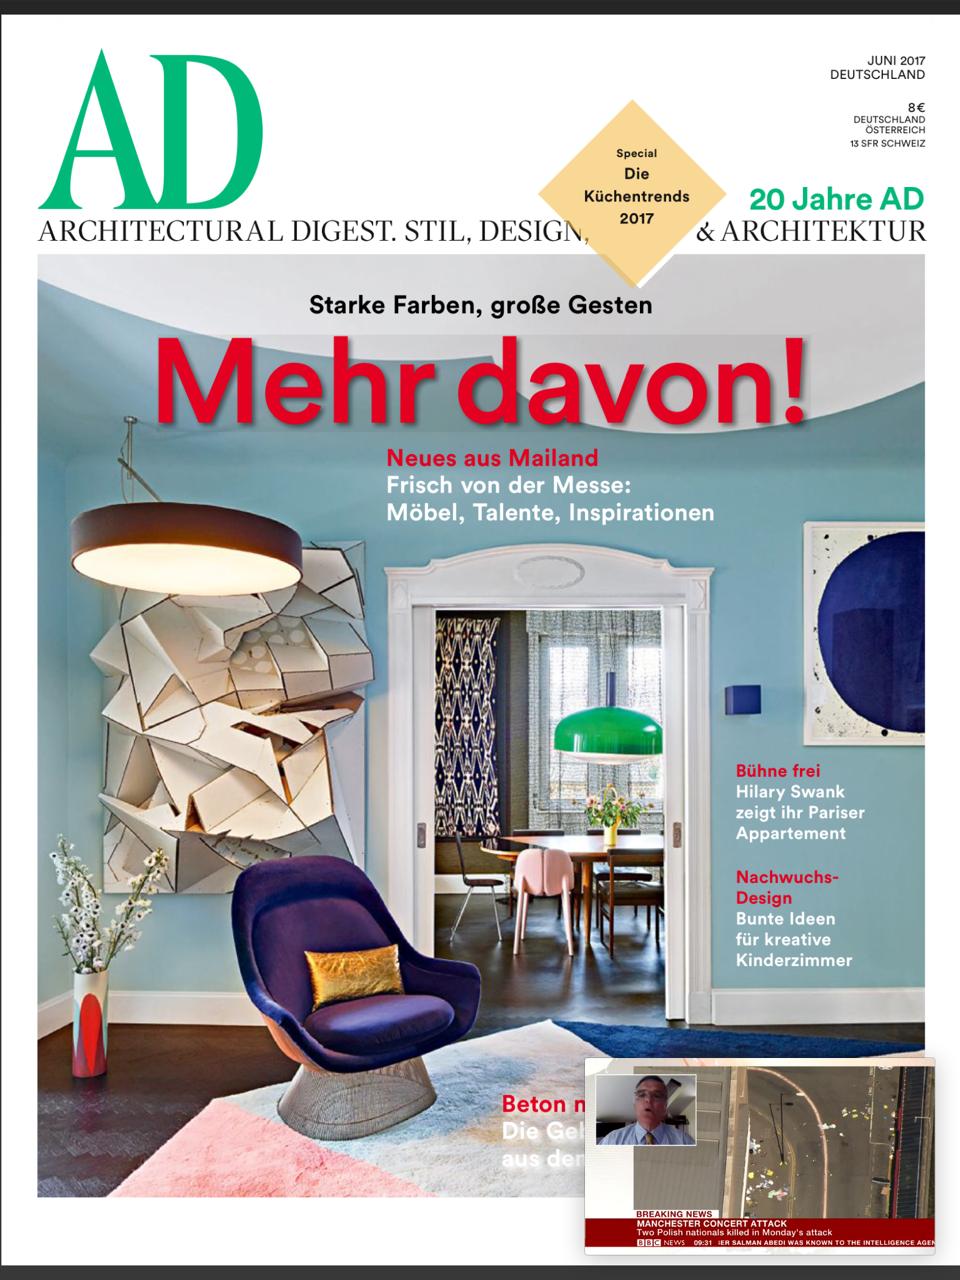 AD Germany - June 2017